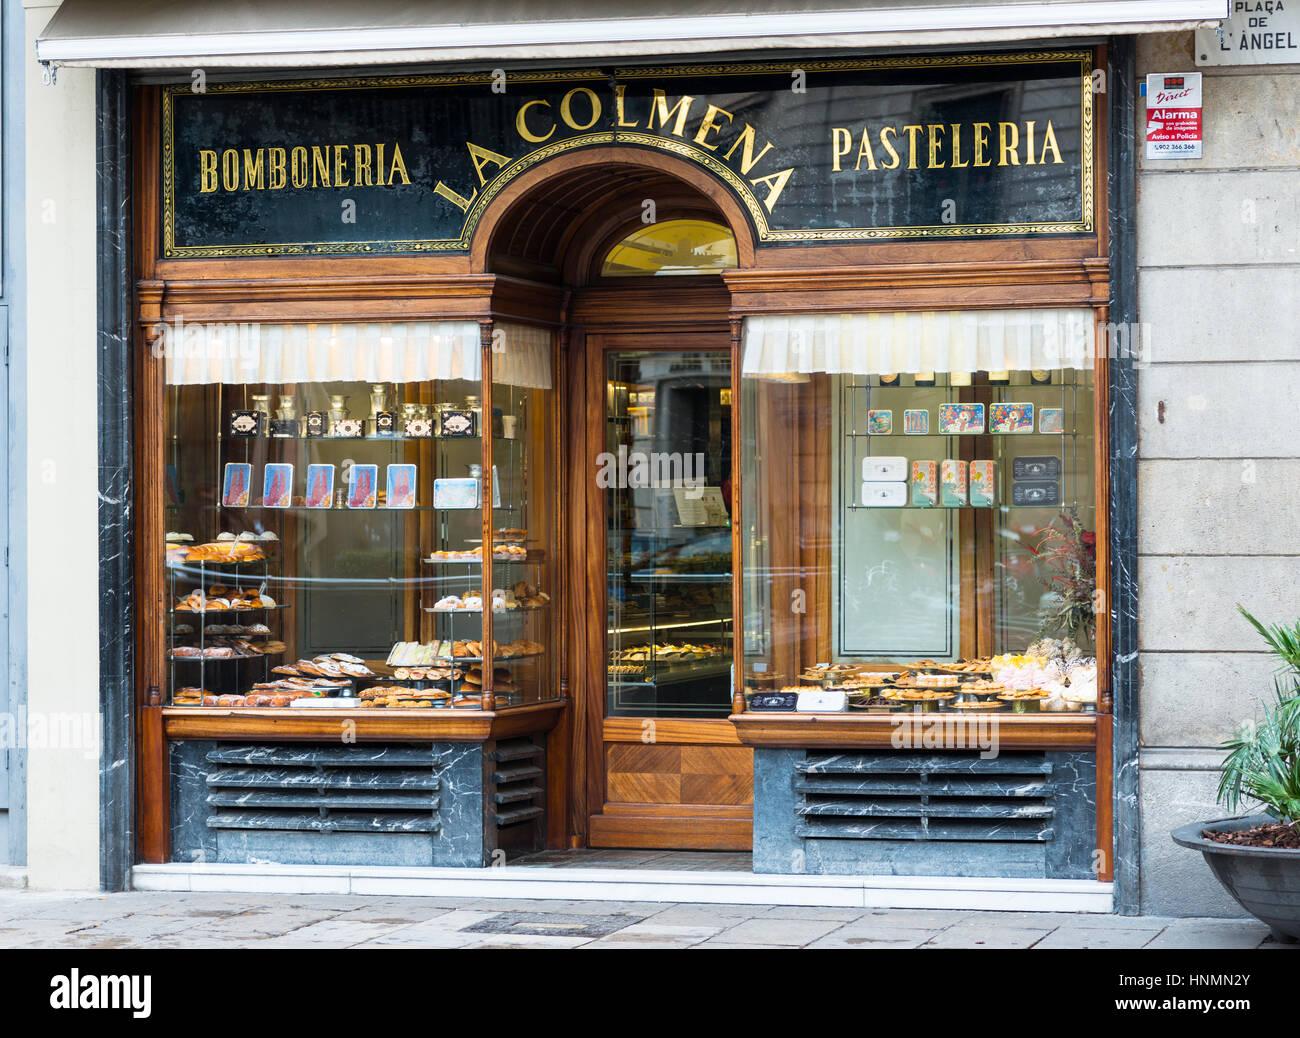 Traditional sweet and pastry shop (bomboneria pasteleria) La Colmena in Plaça del Ángel, Barcelona, Catalonia, - Stock Image